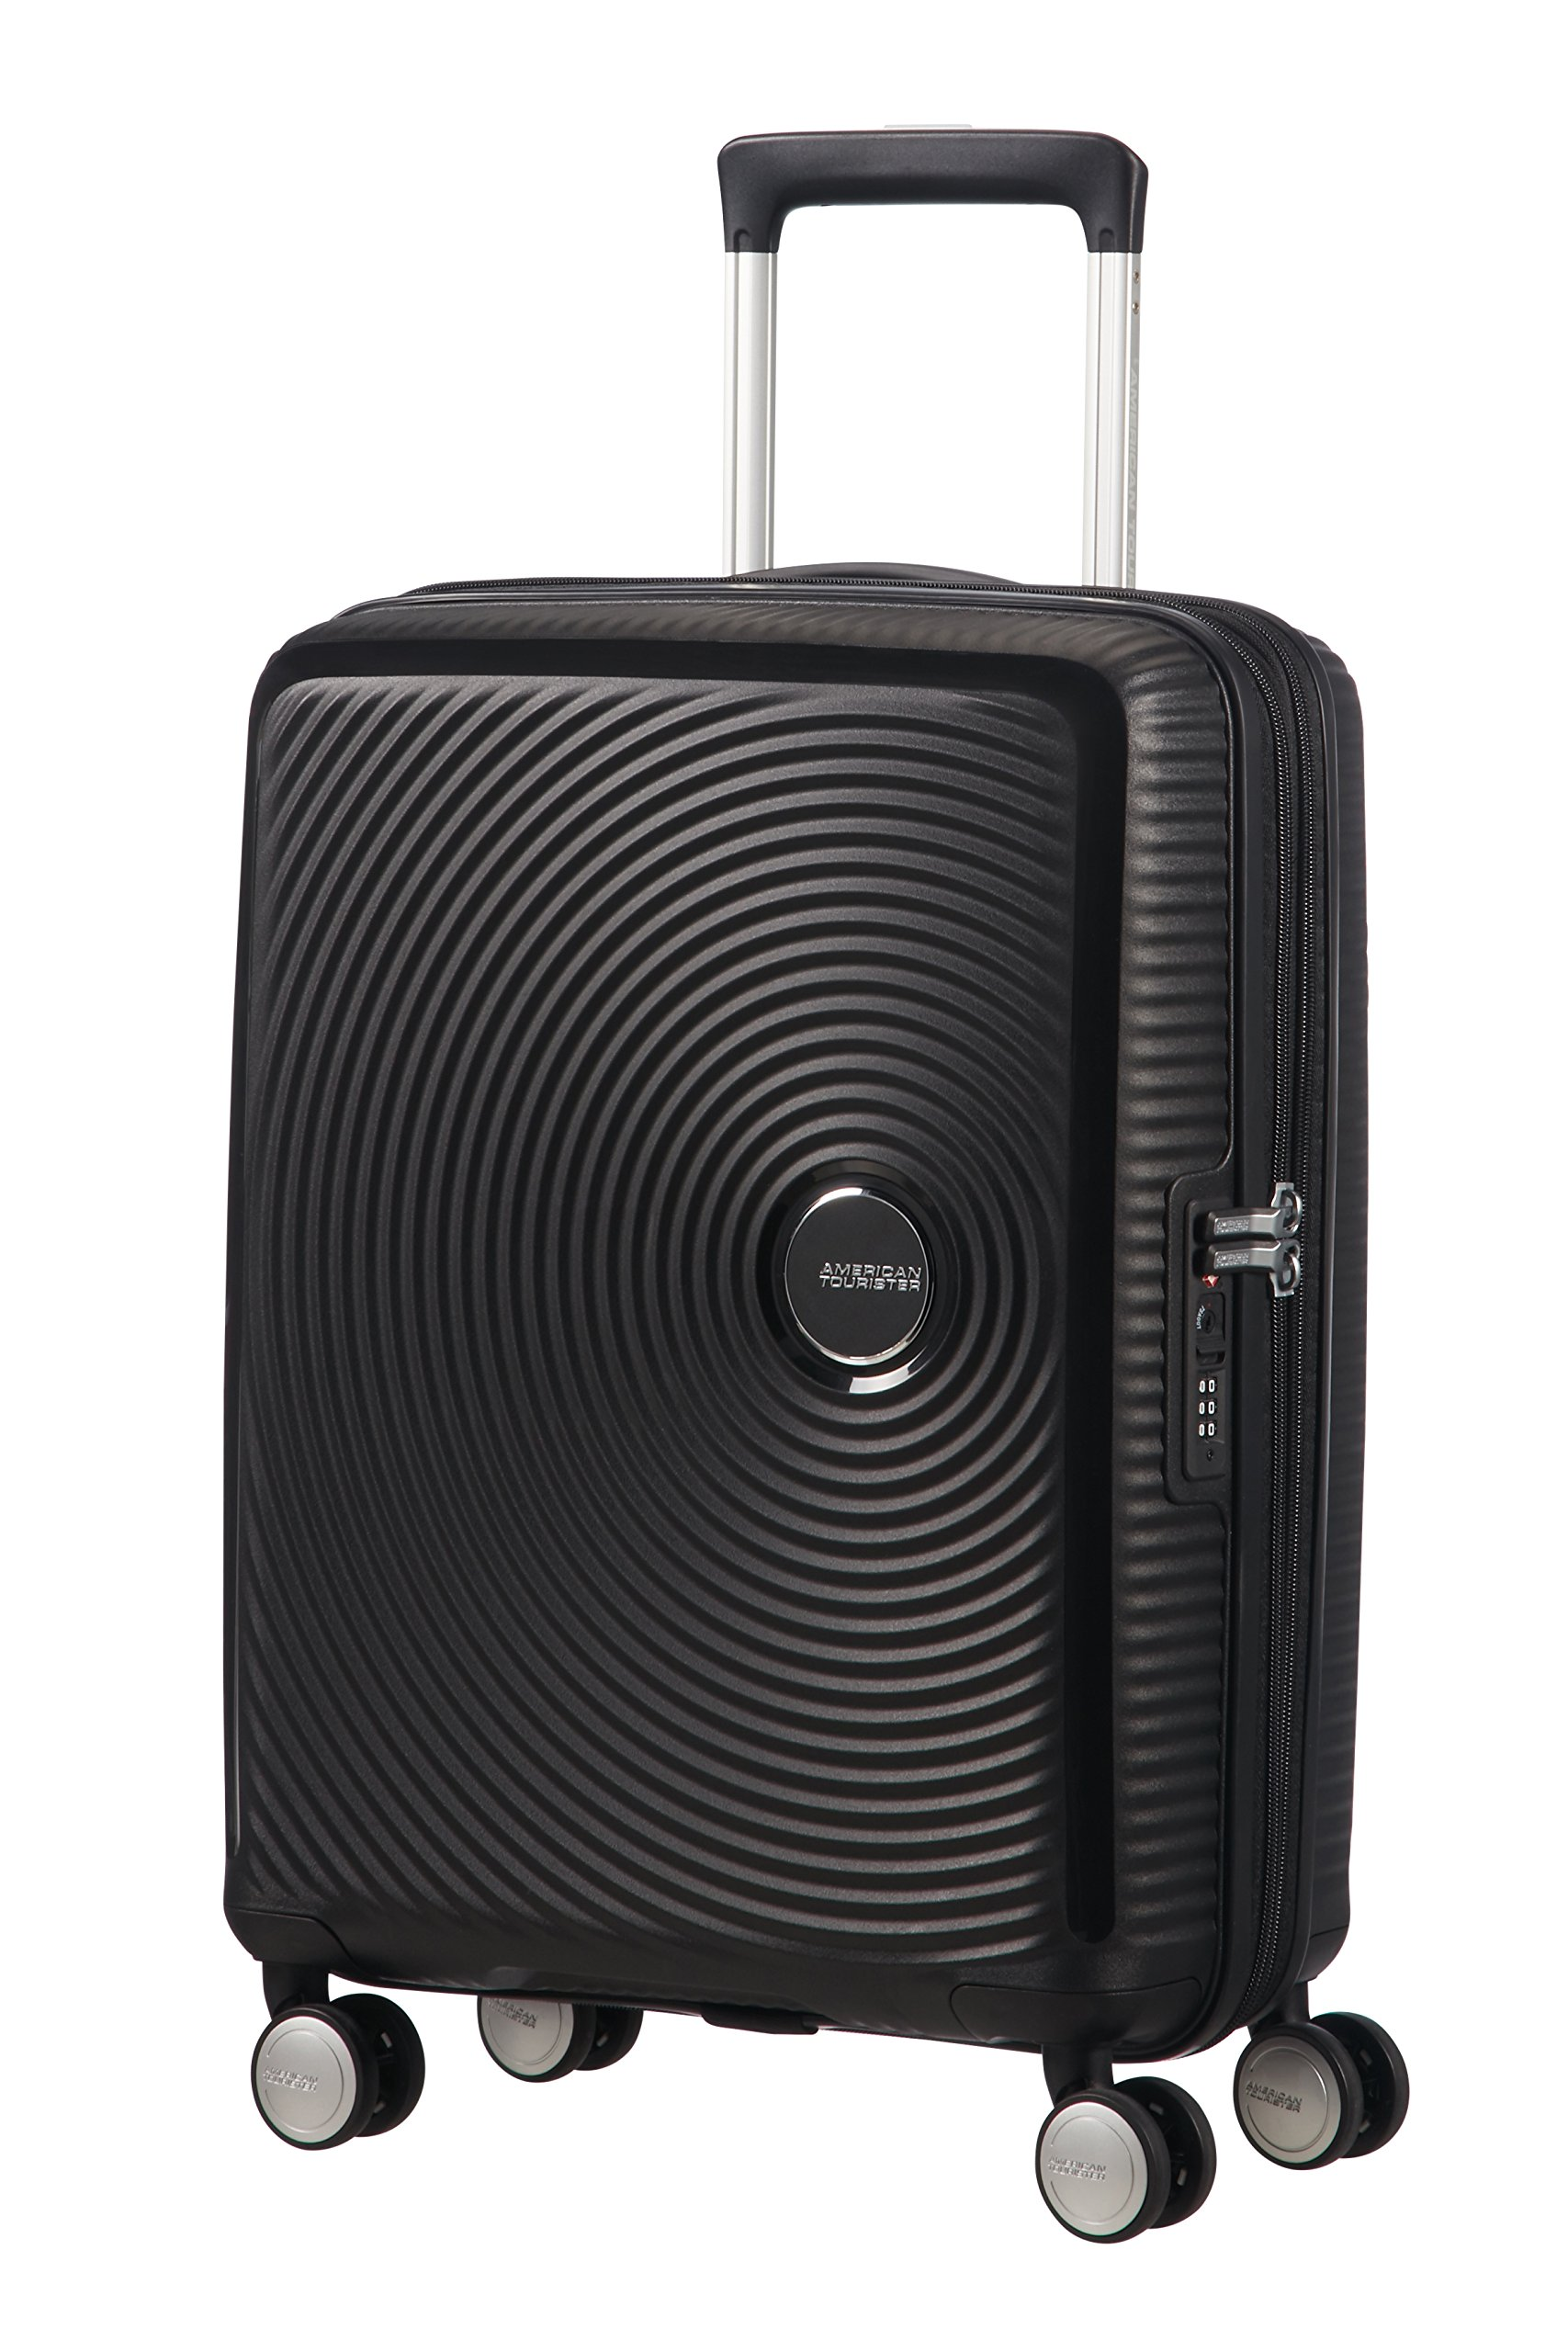 ab8b1e636 American Tourister - Soundbox Spinner Expandible, 55cm, 35,5/41 L - 2,6 KG,  Negro (Bass Black)